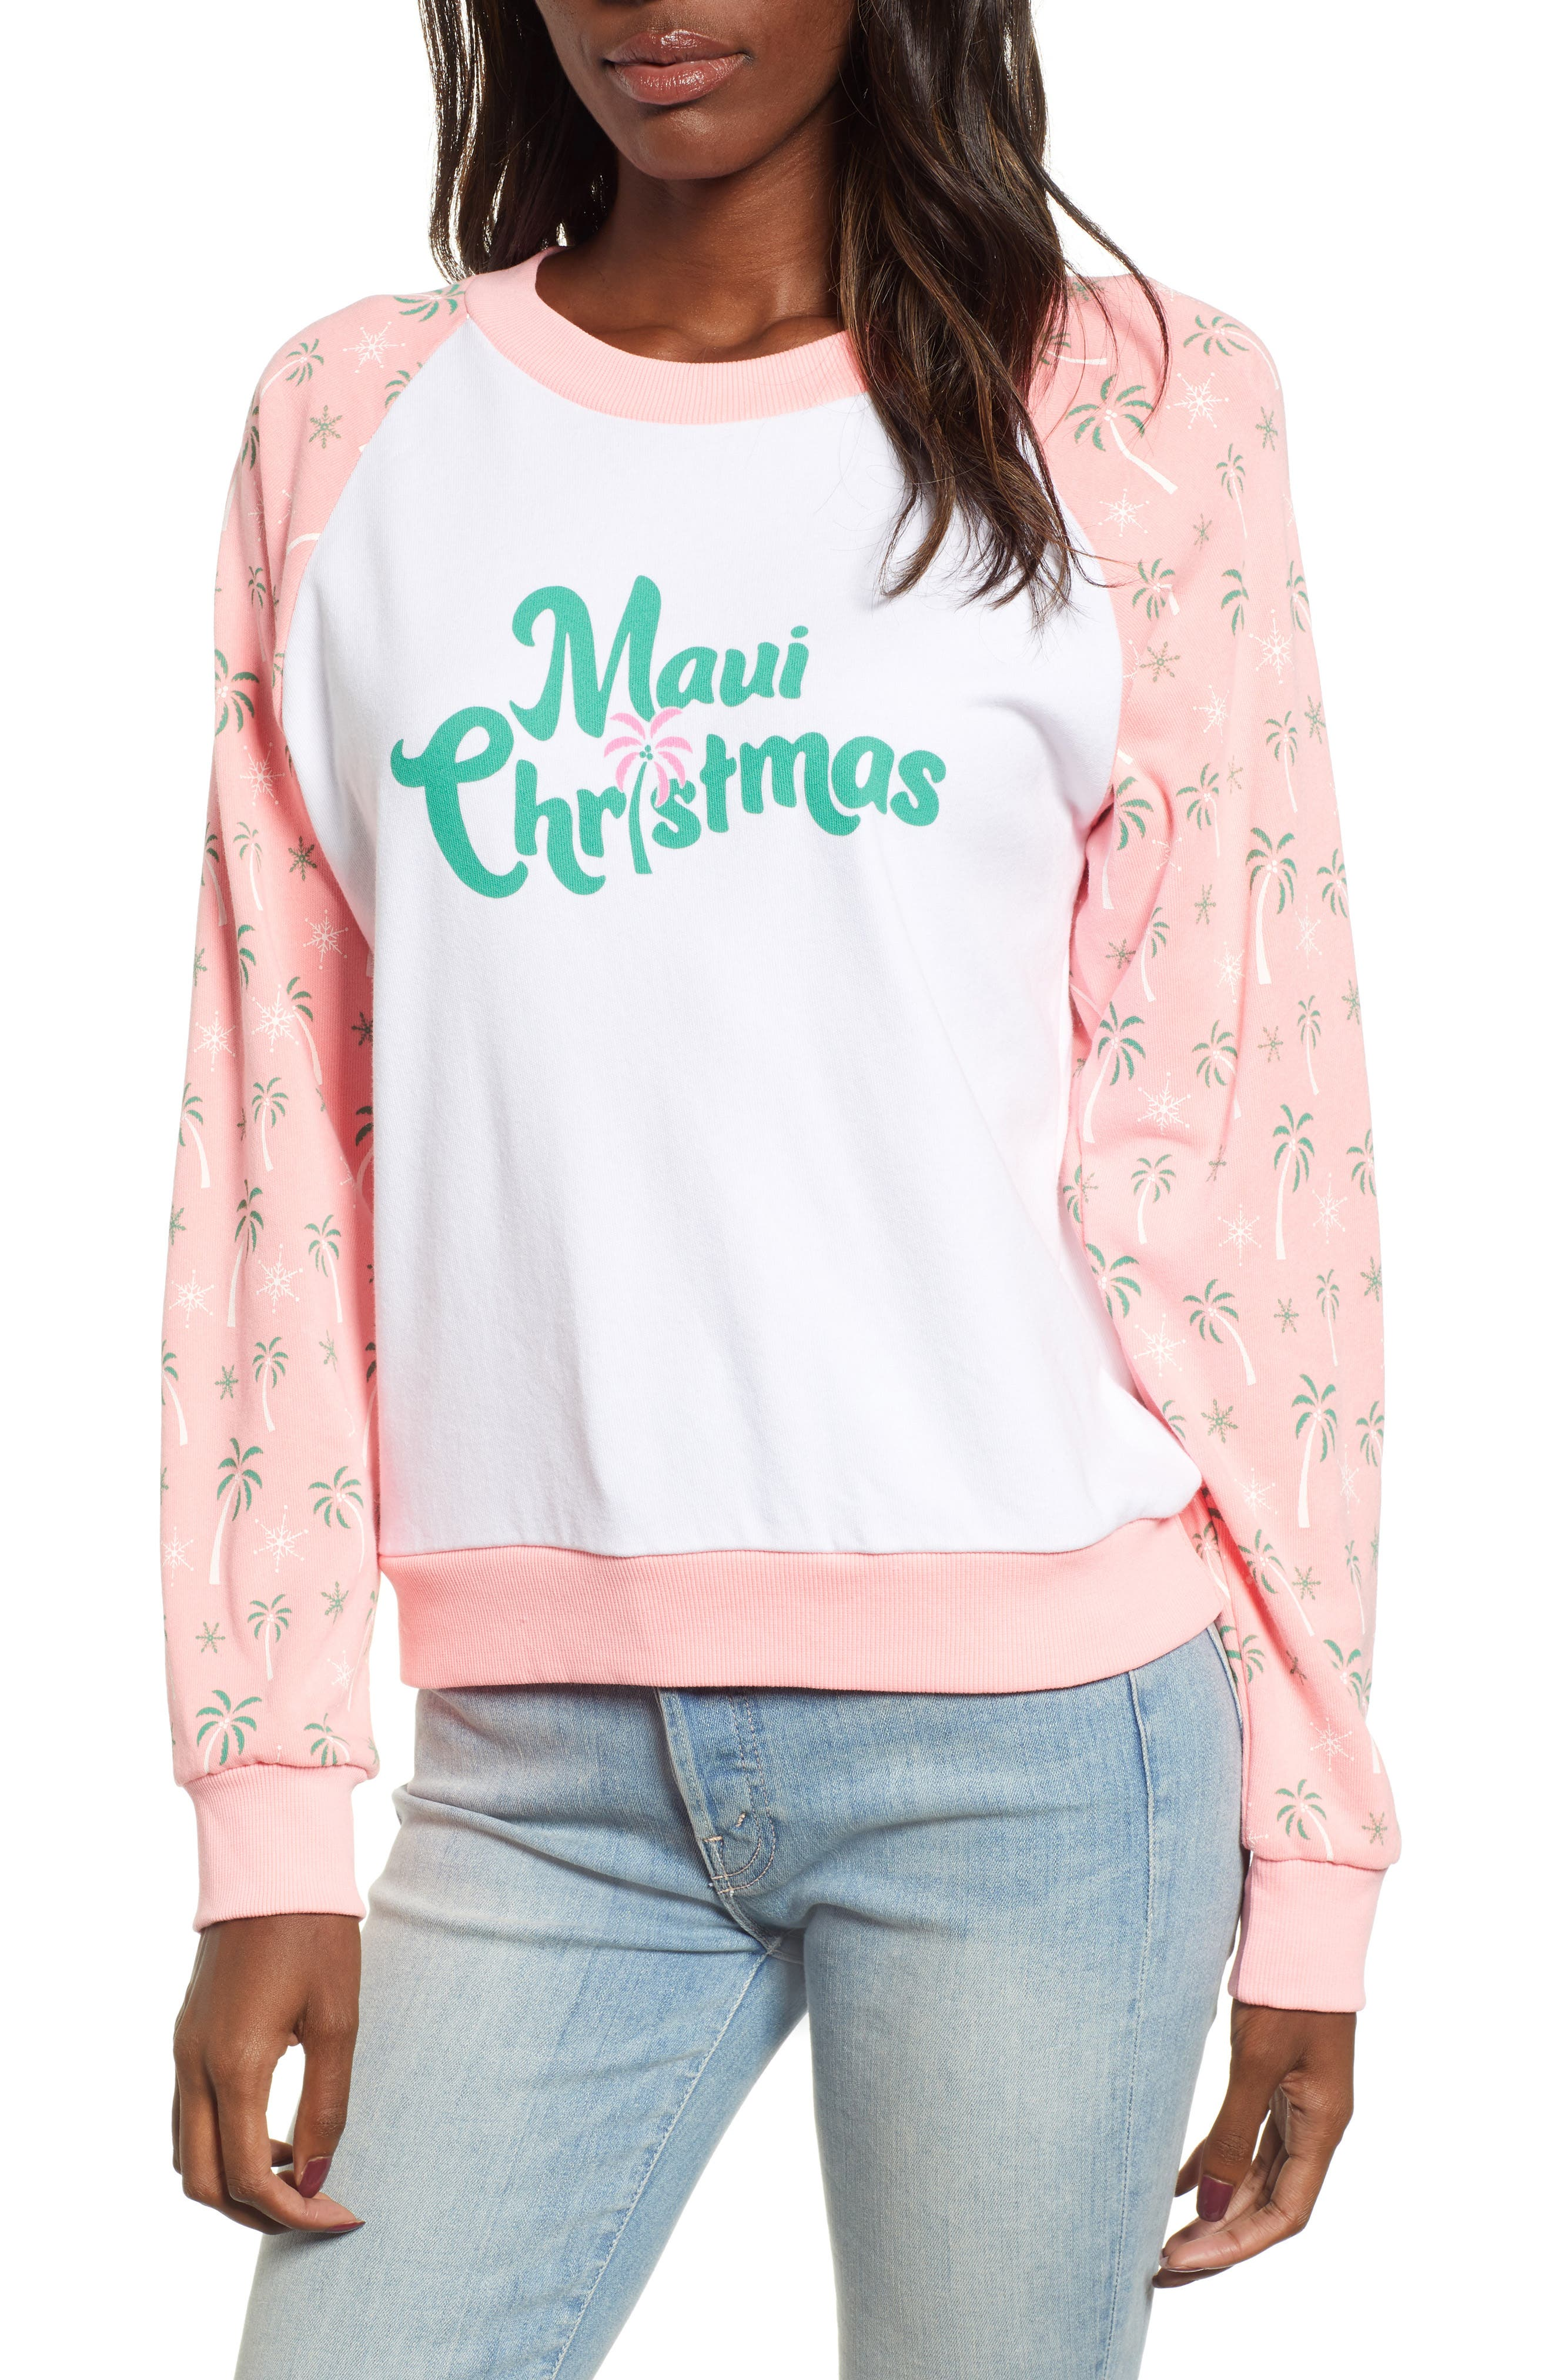 Maui Christmas Fiona Sweatshirt,                         Main,                         color, CLEAN WHITE NEON SIGN